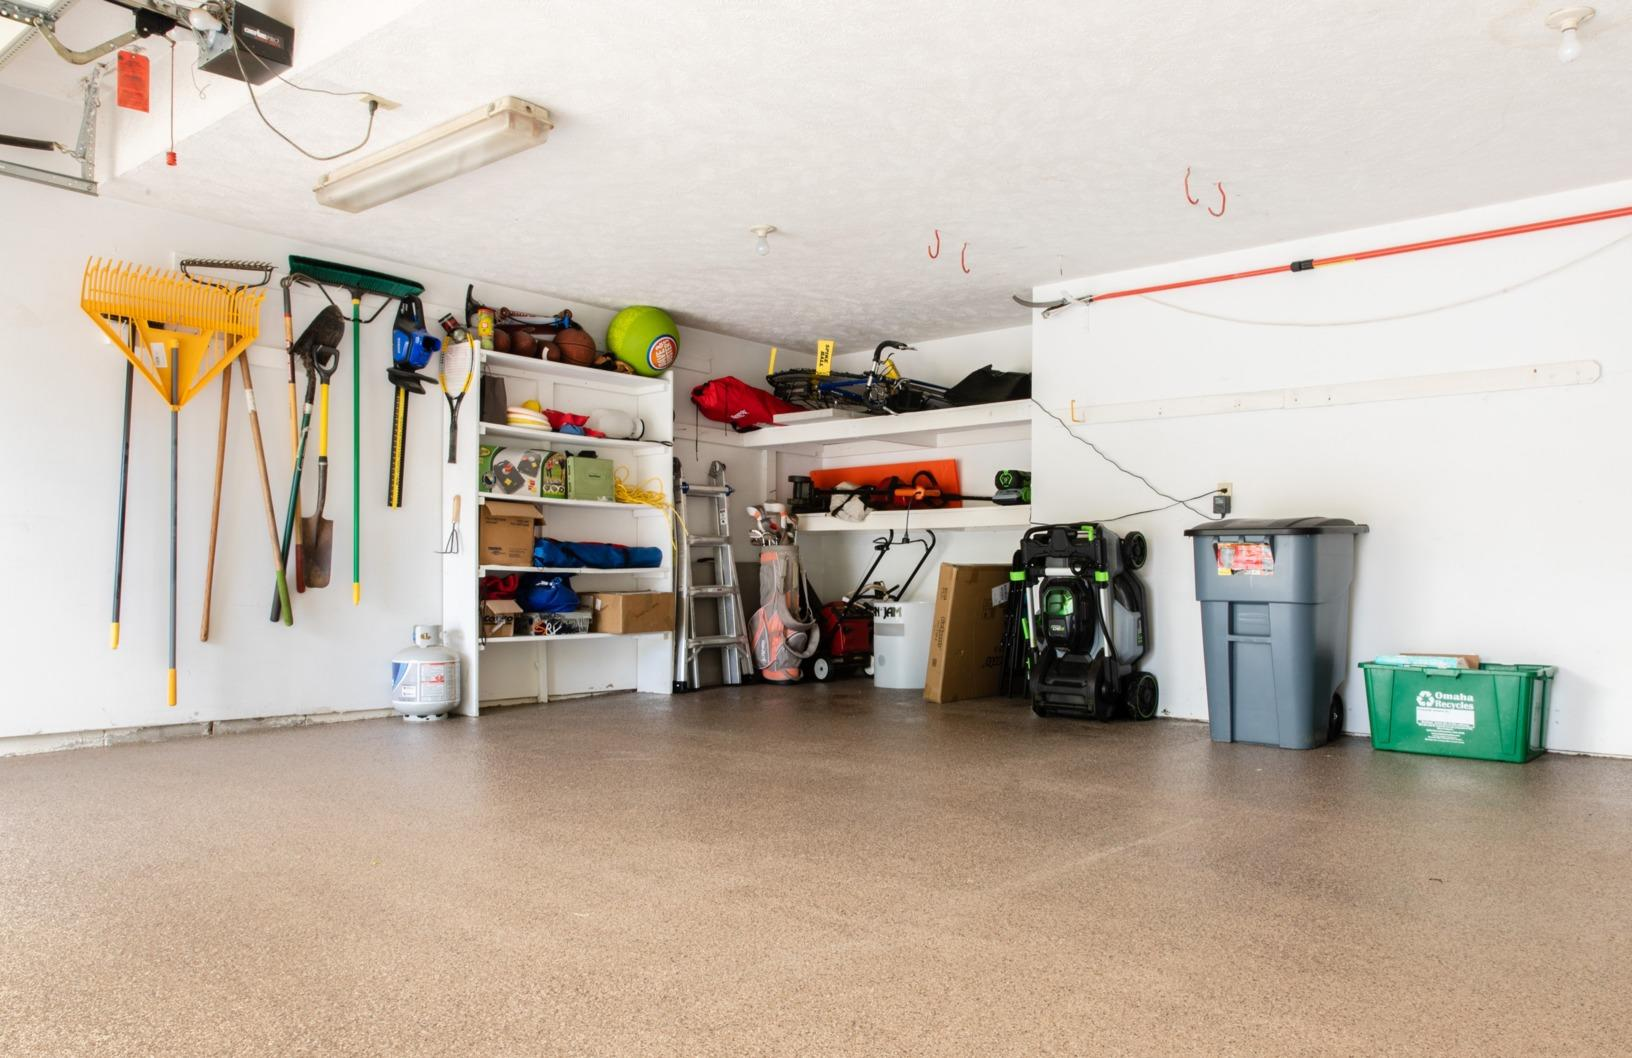 Gear Filled Garage Gets Lifetime Transformation in Lewes, DE - After Photo